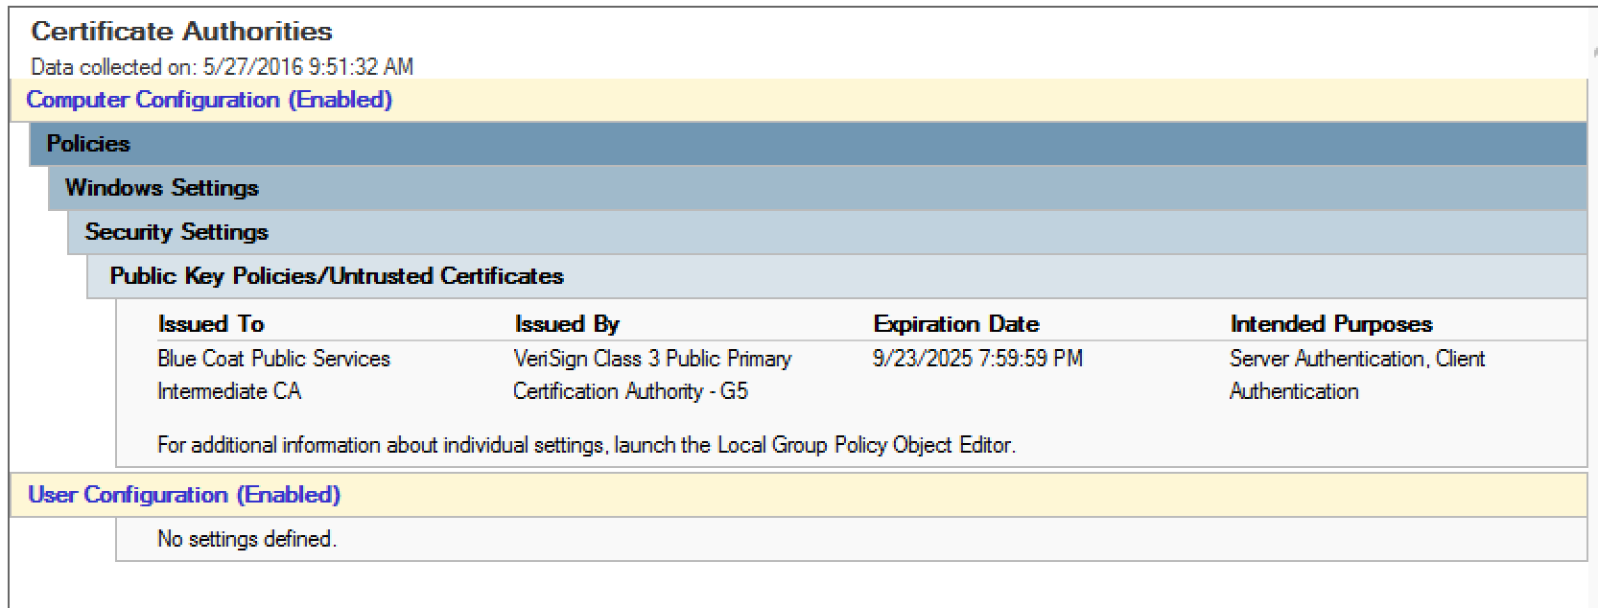 Revoking And Pinning Certificate Authorities In Windows